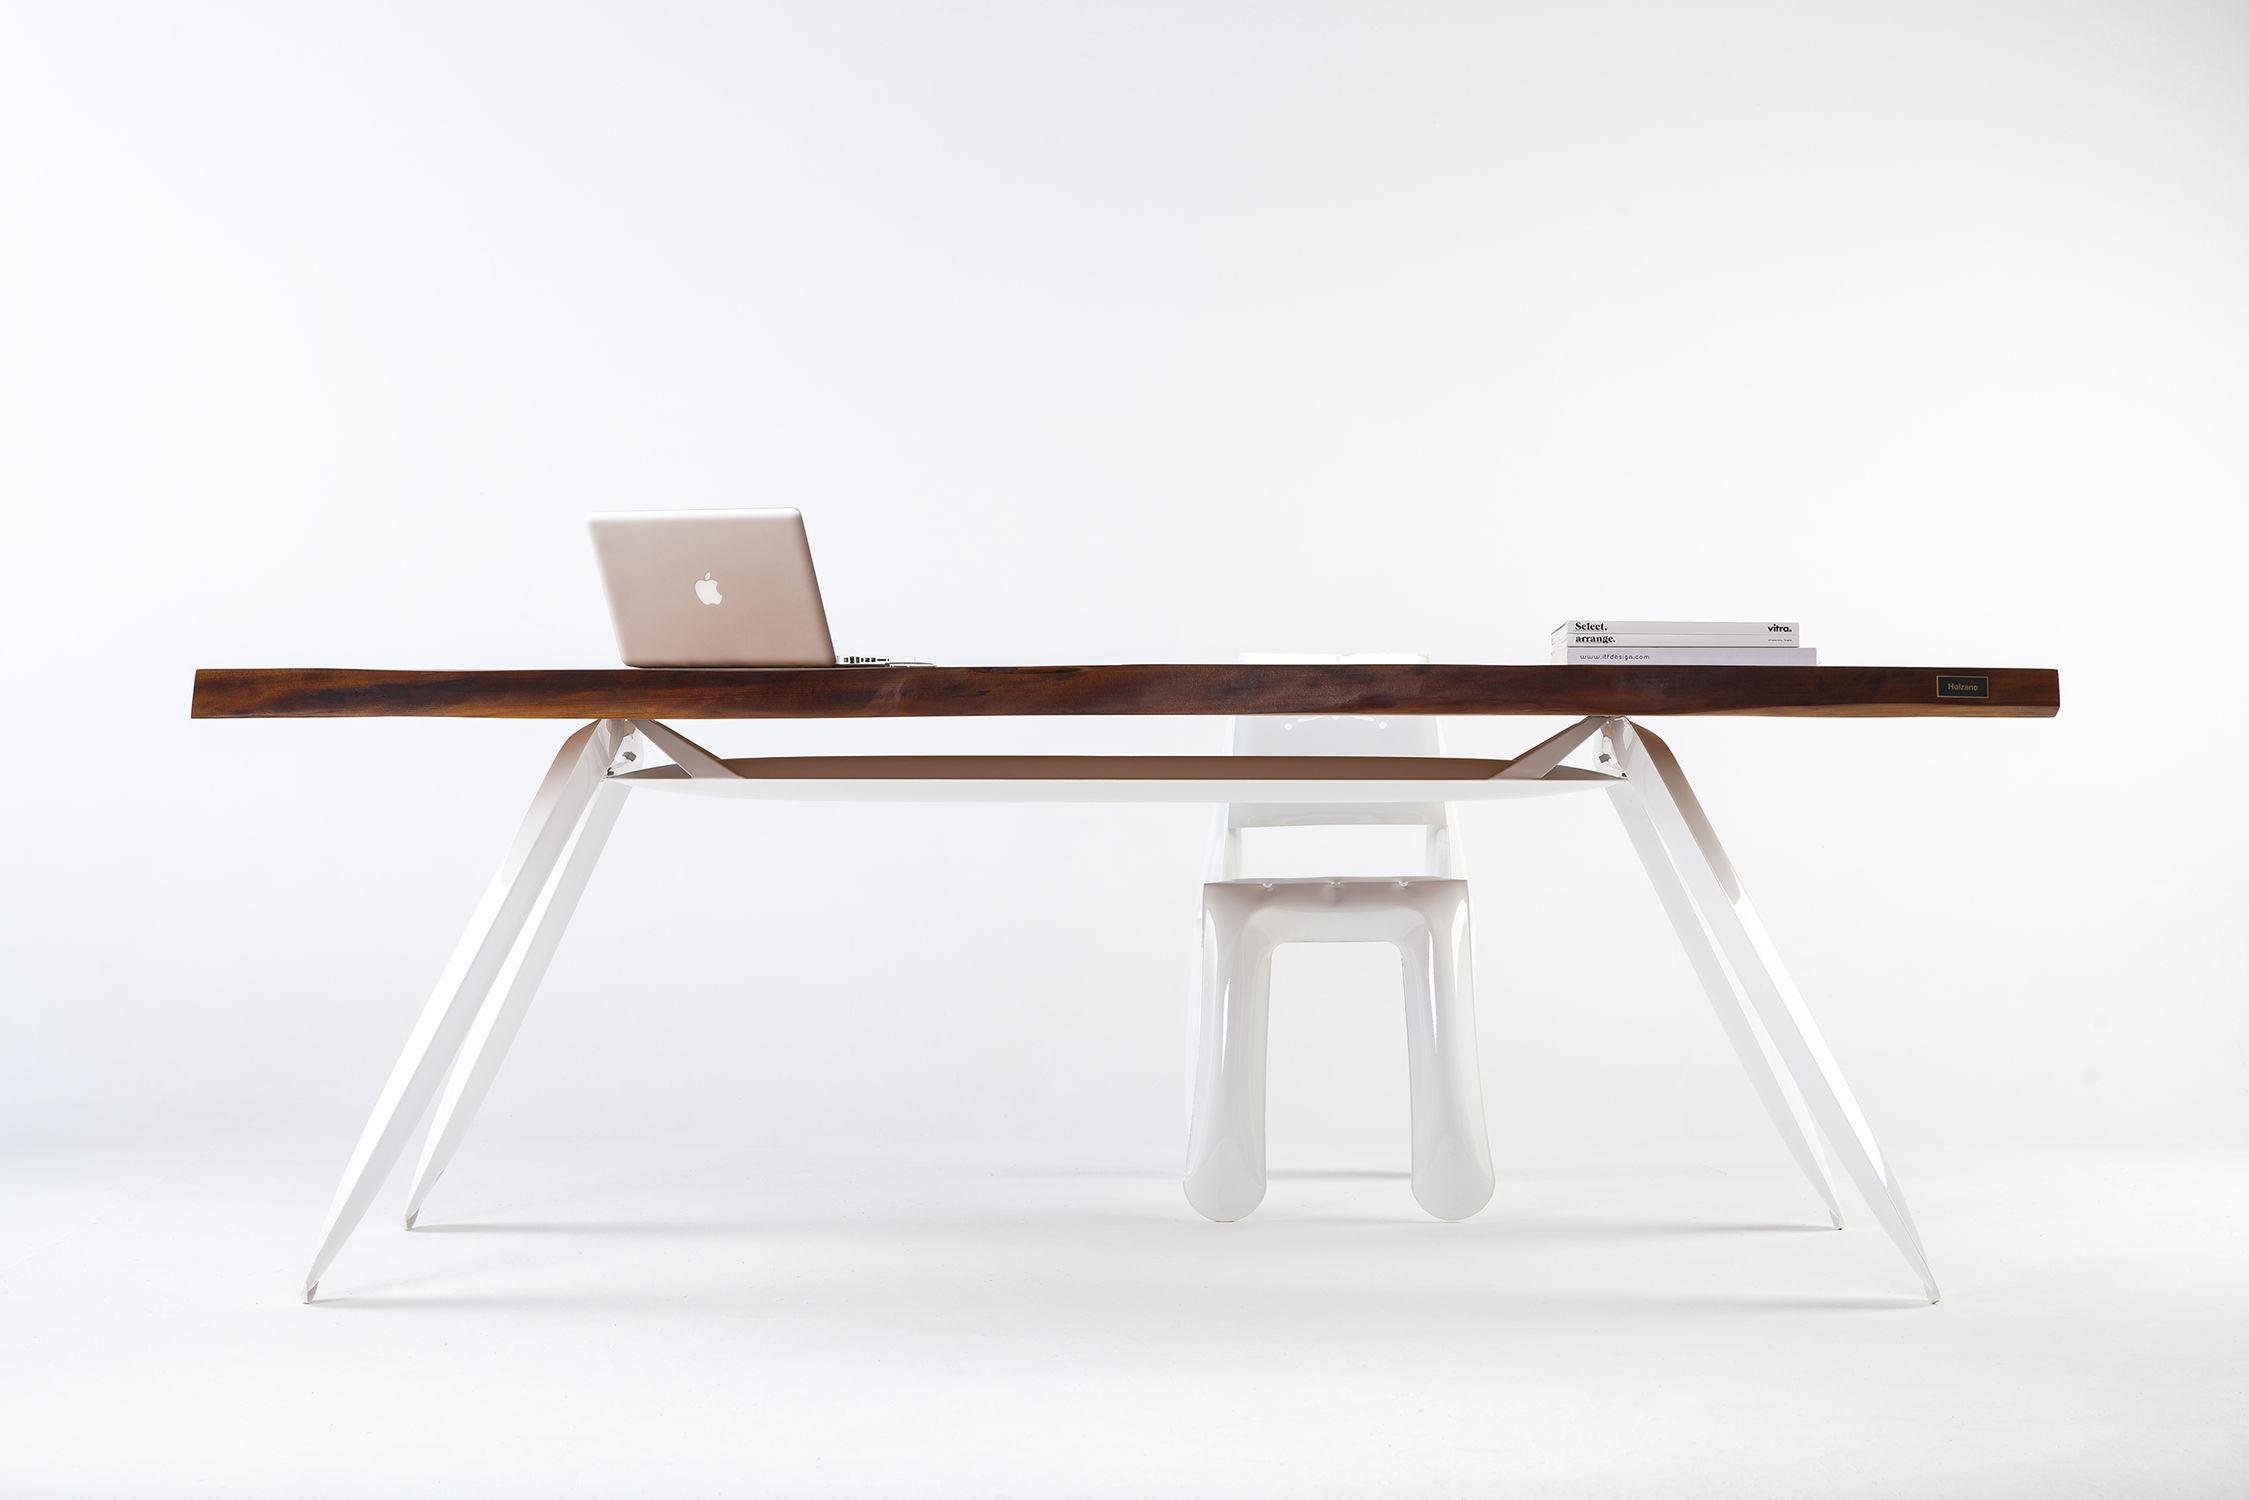 moderner tisch / holz / stahl / rechteckig - kauri - zieta - Moderner Esstisch Holz Stahl